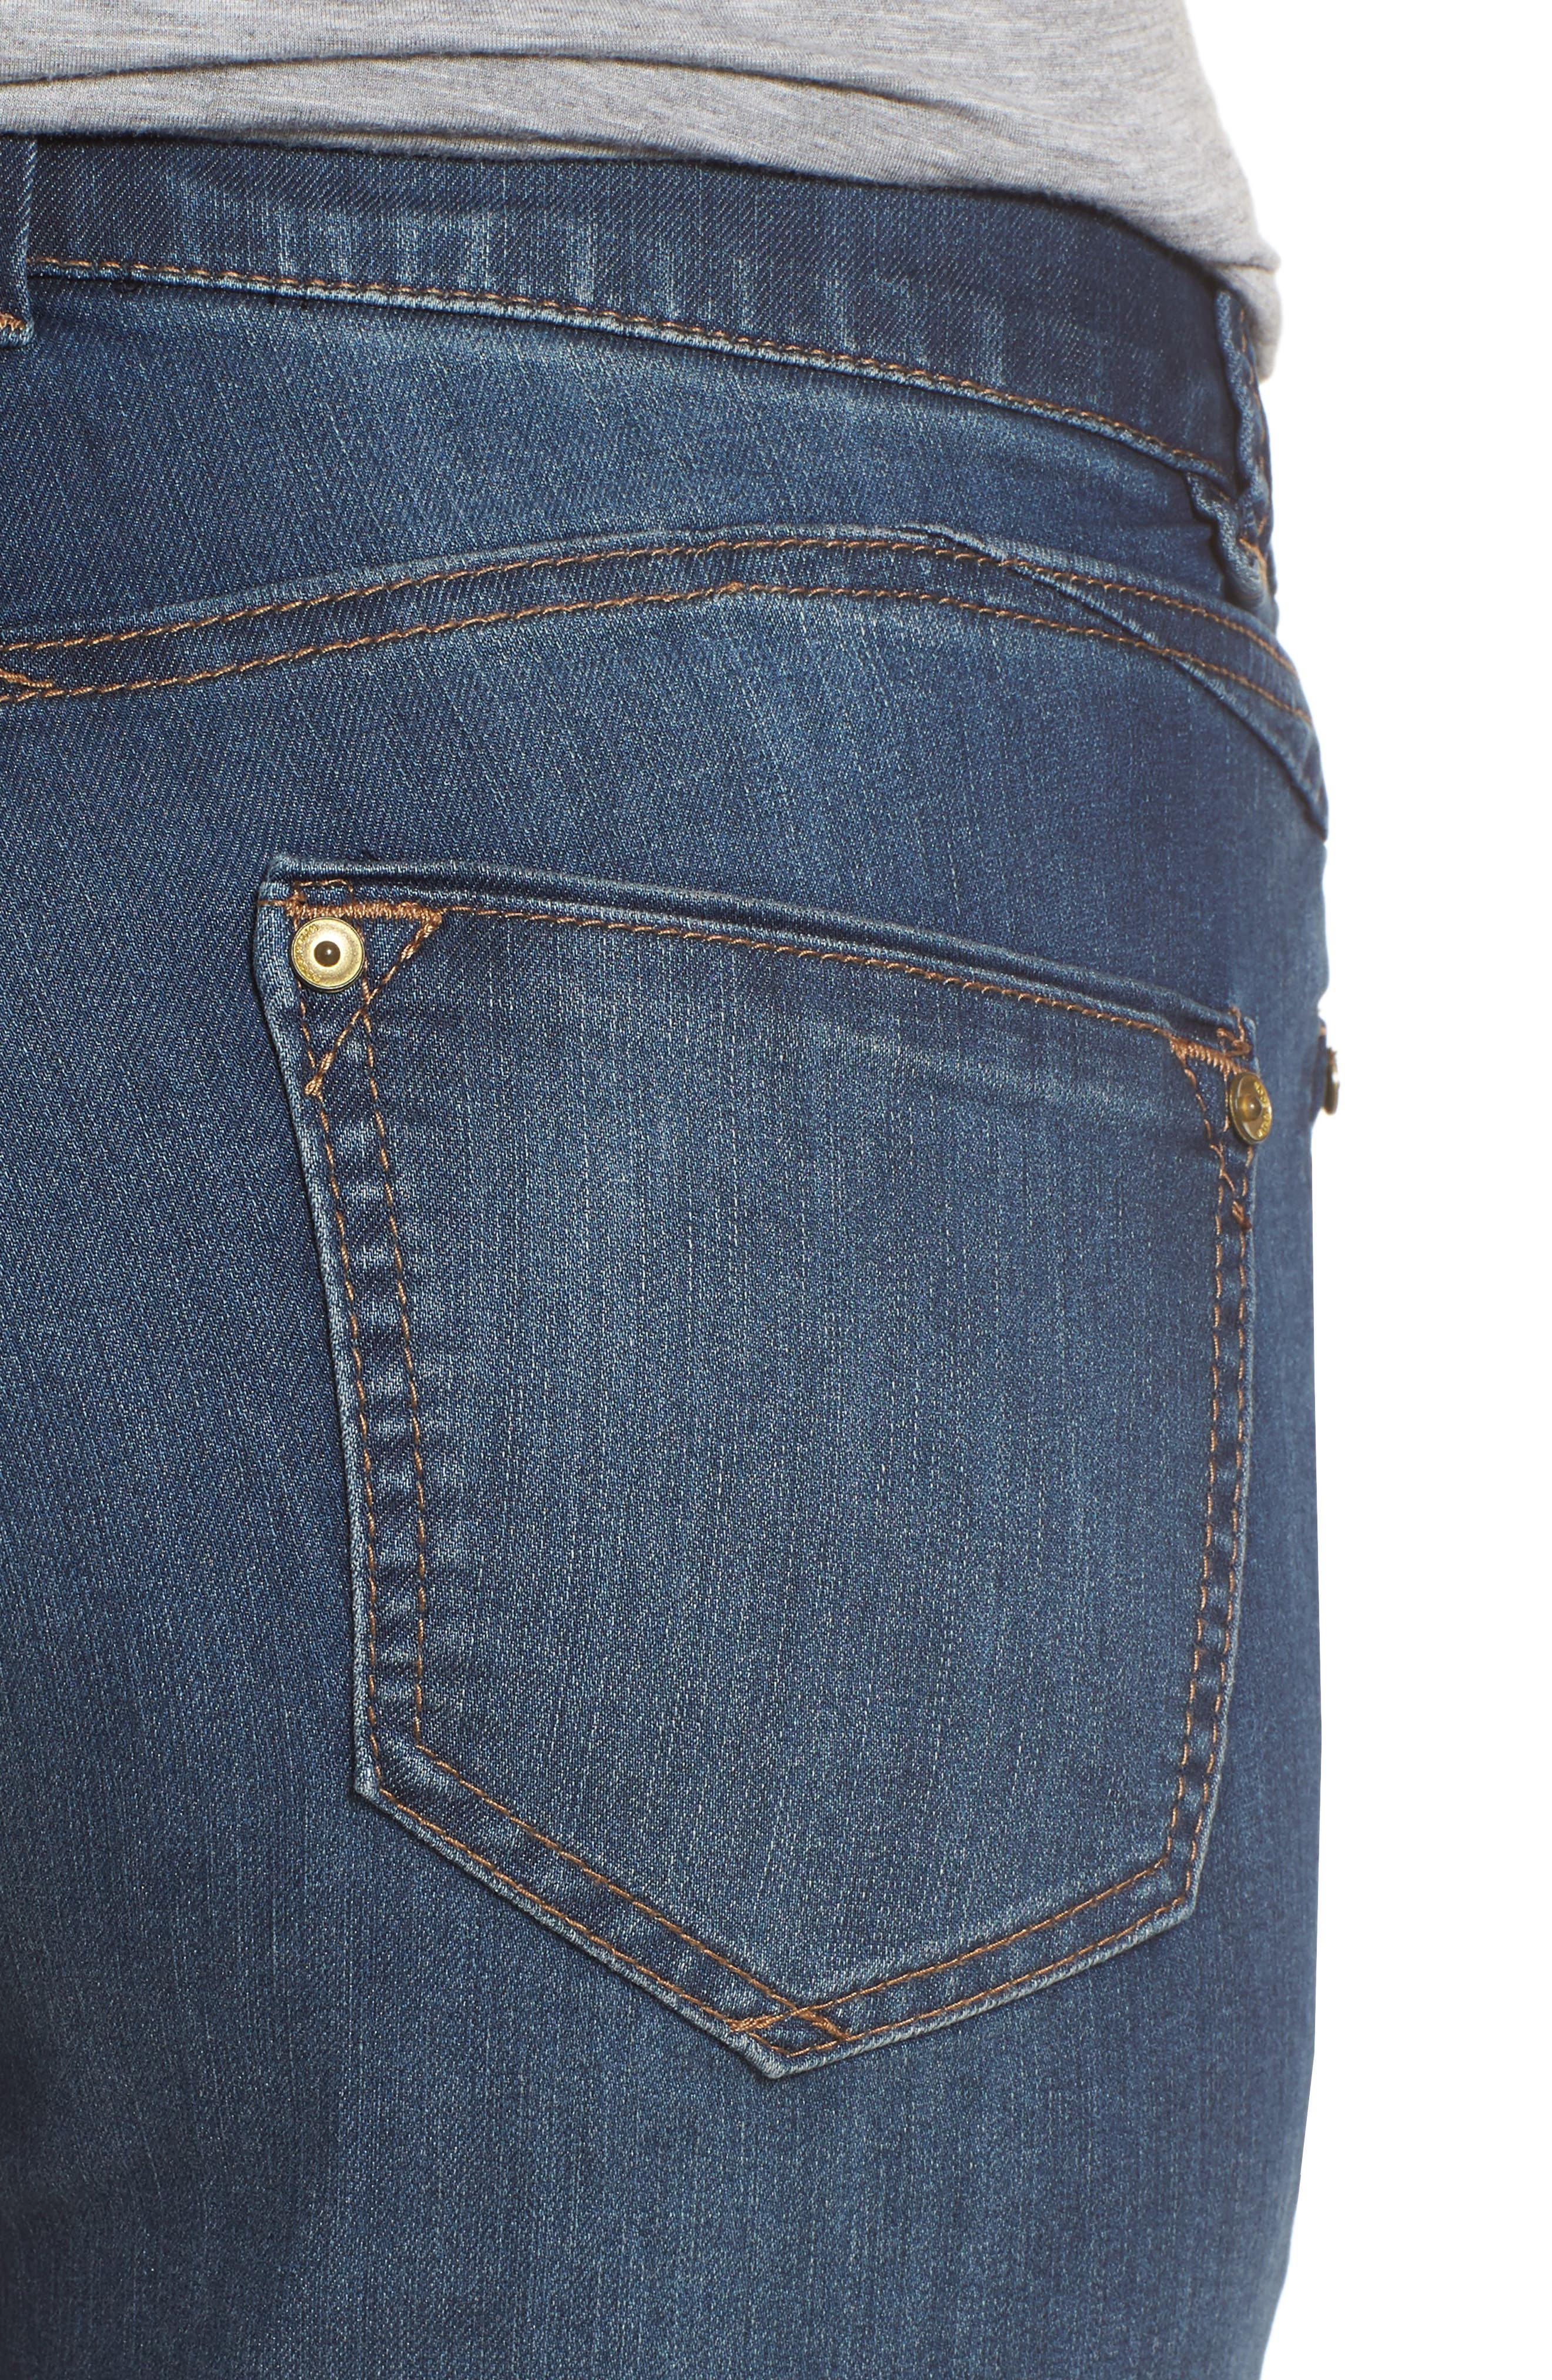 Alternate Image 4  - Wit & Wisdom Ab-solution Cuffed Denim Shorts (Nordstrom Exclusive)